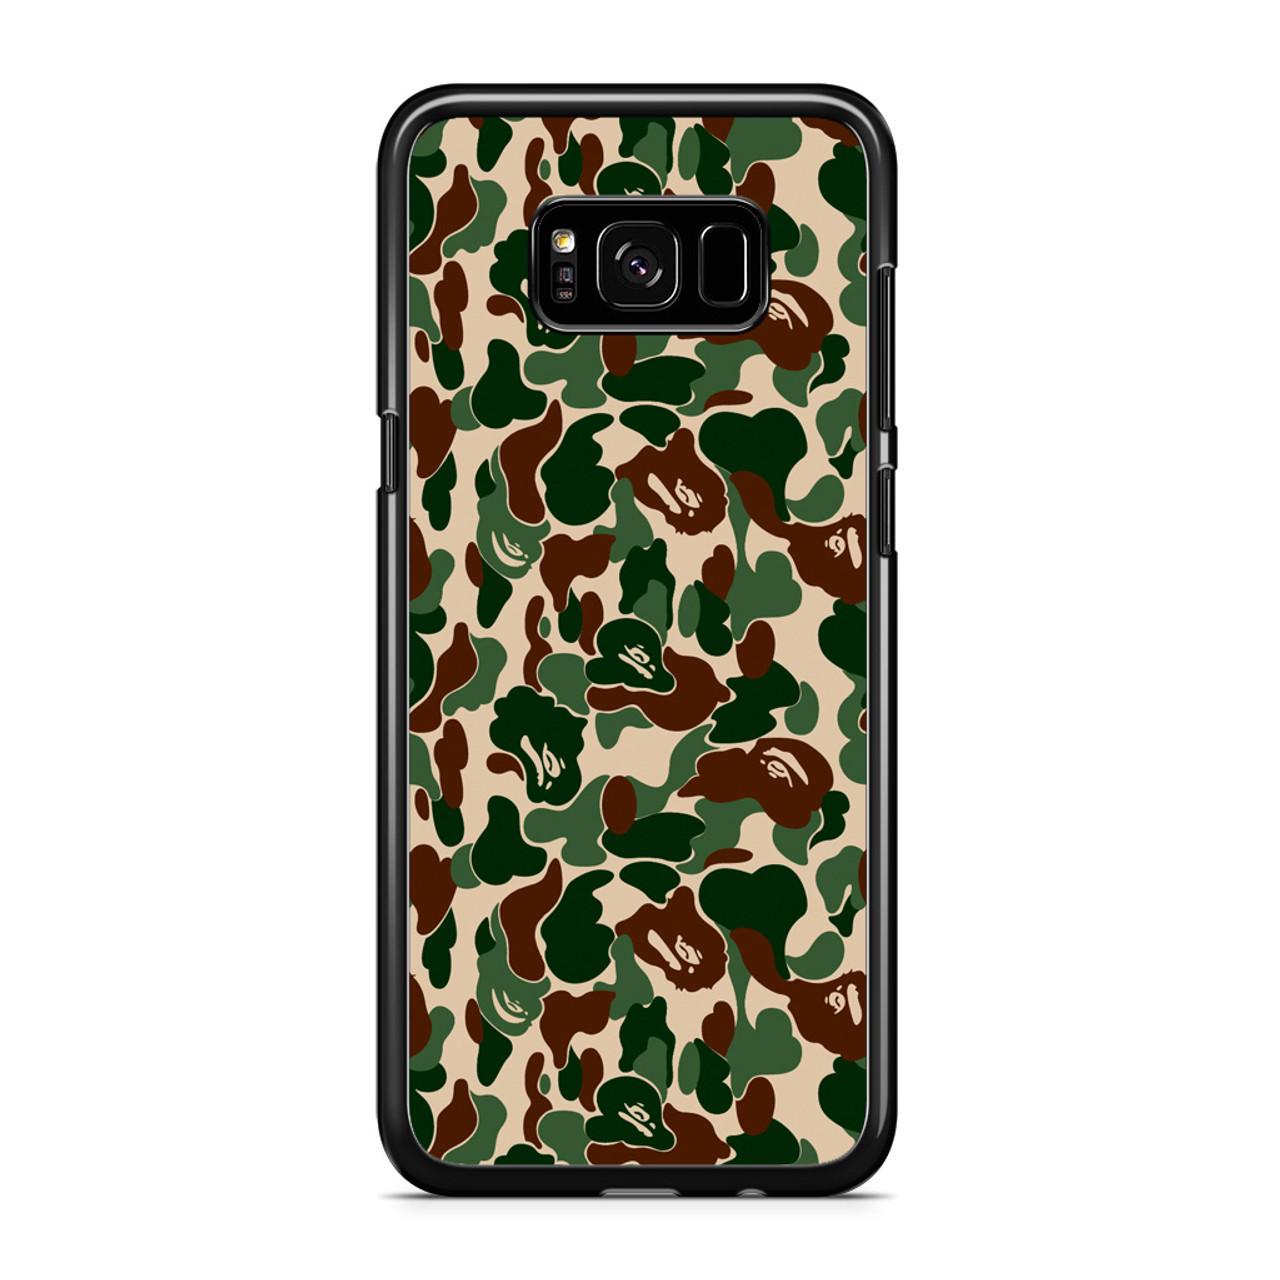 huge selection of 91c77 8544b Bathing Ape Bape Camo Real Tree Samsung Galaxy S8 Case